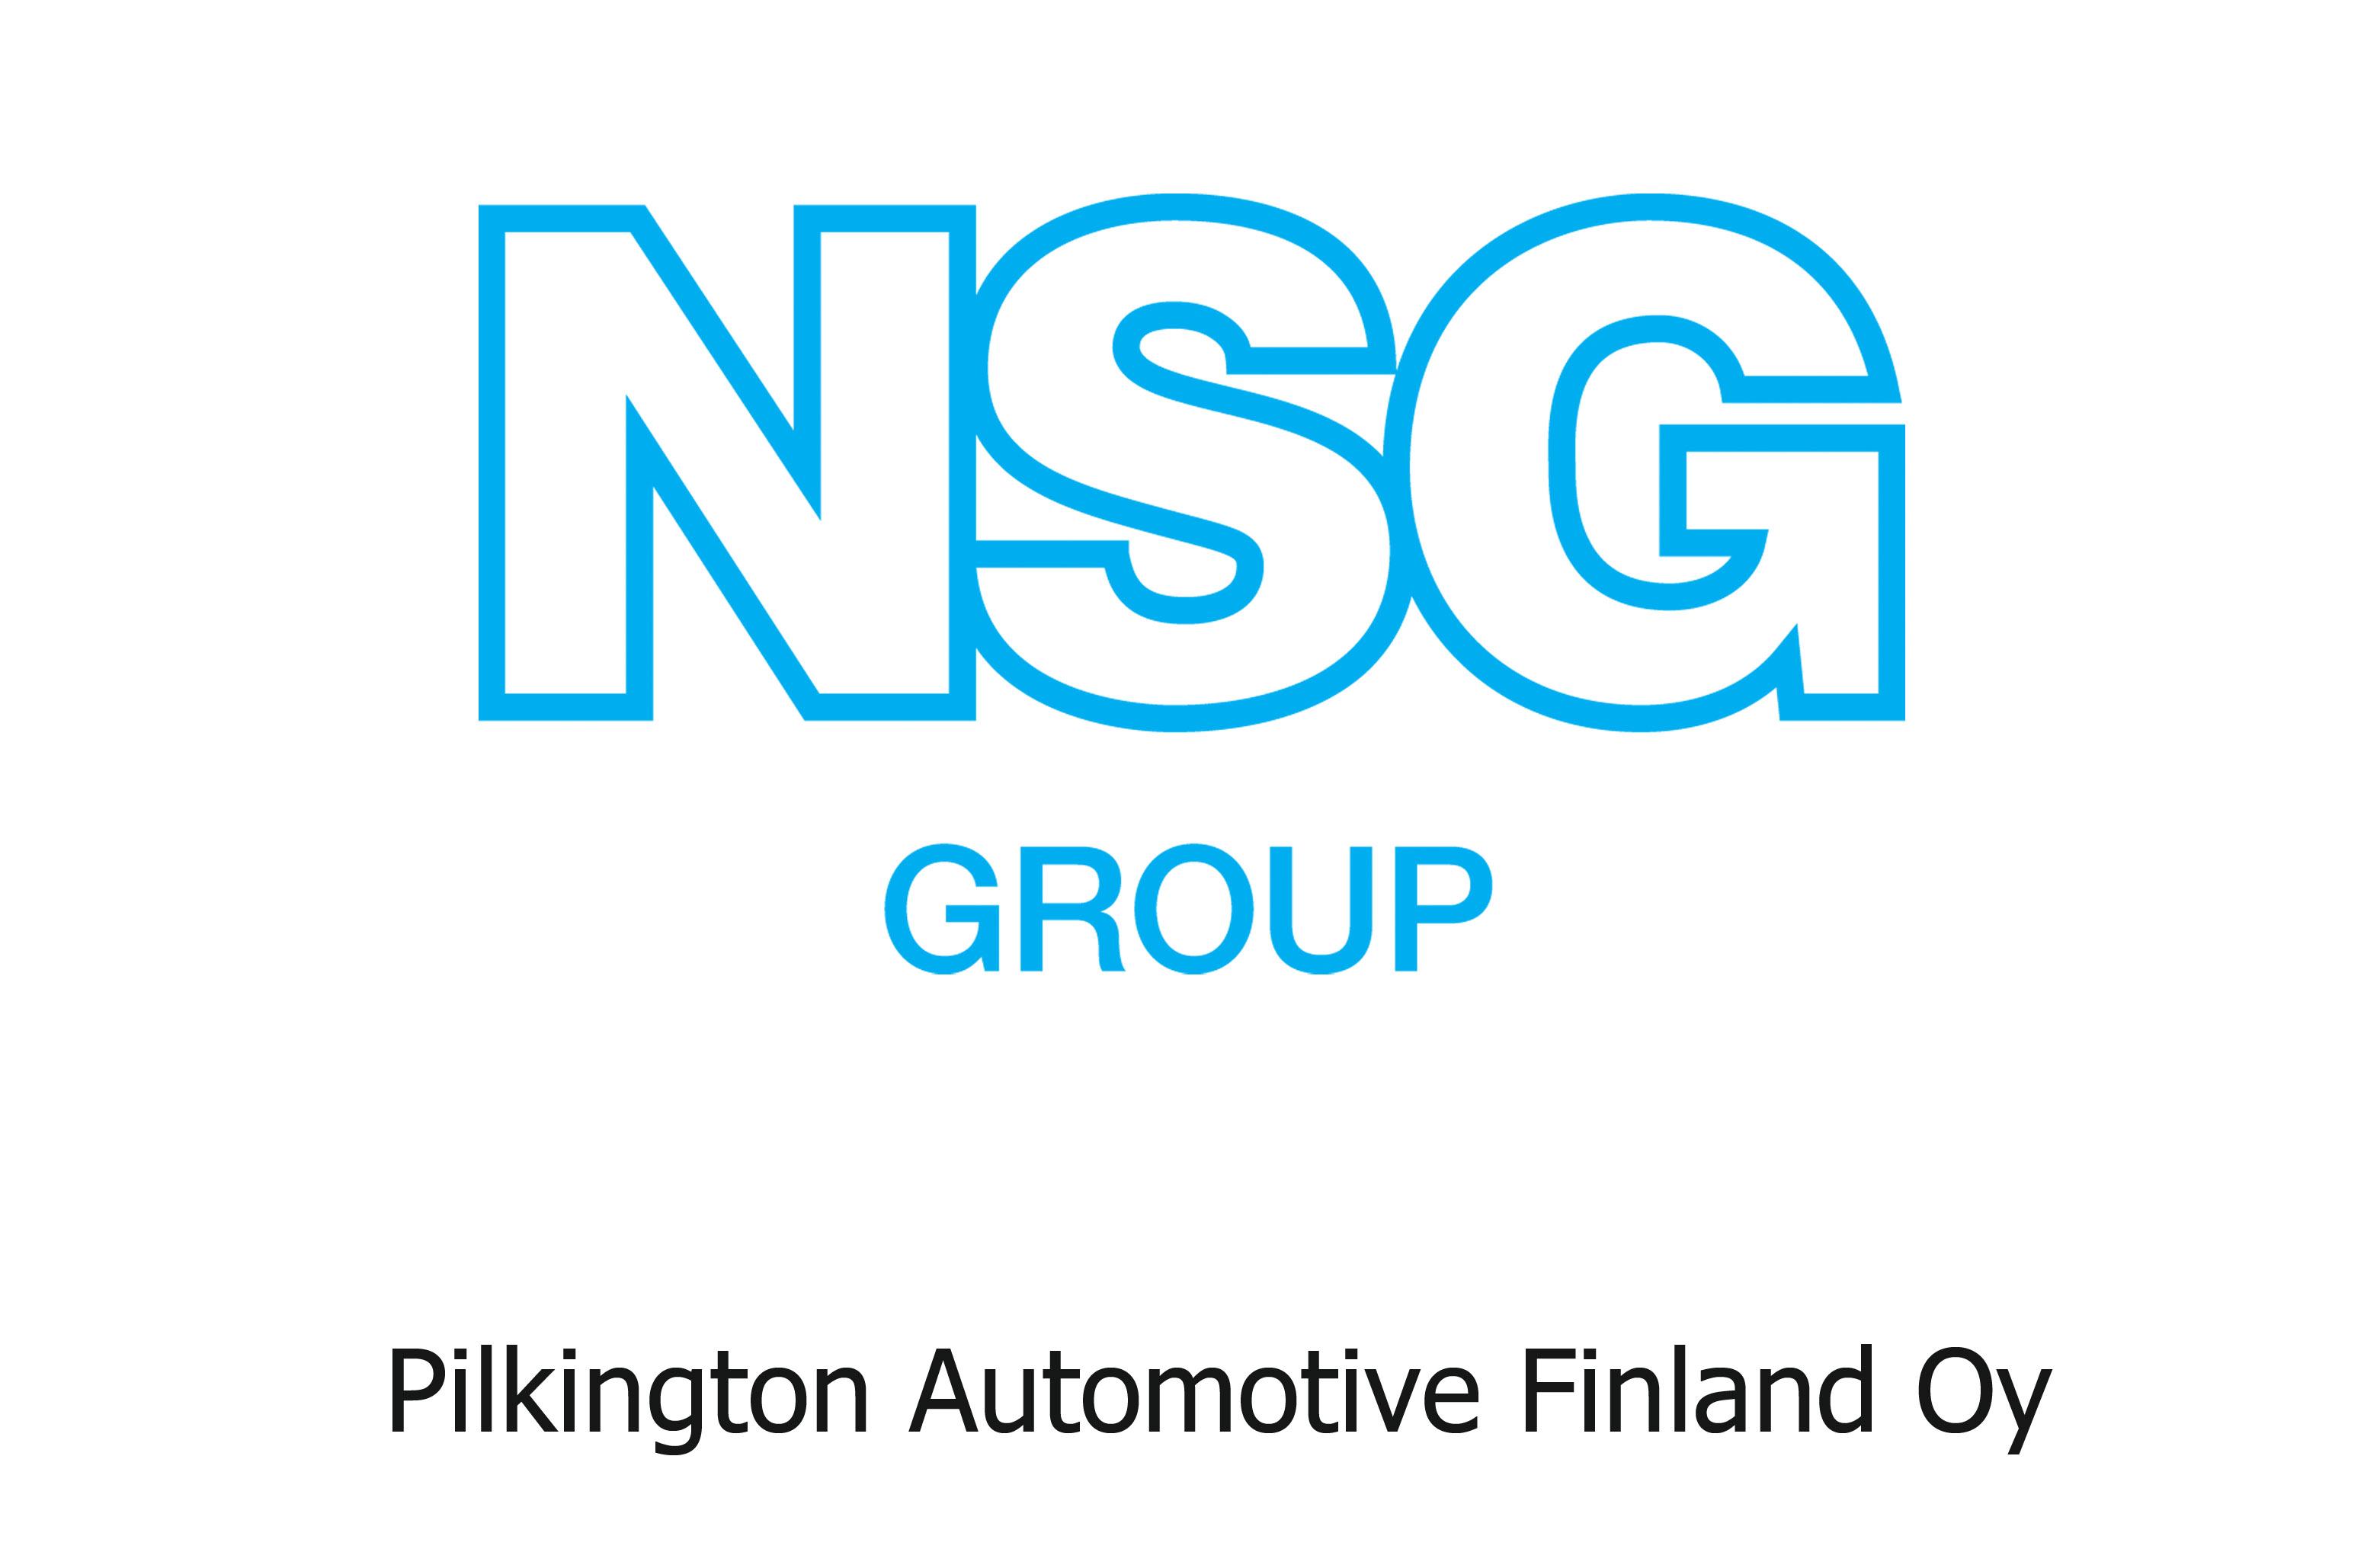 Logo: Pilkington Automotive Finland Oy